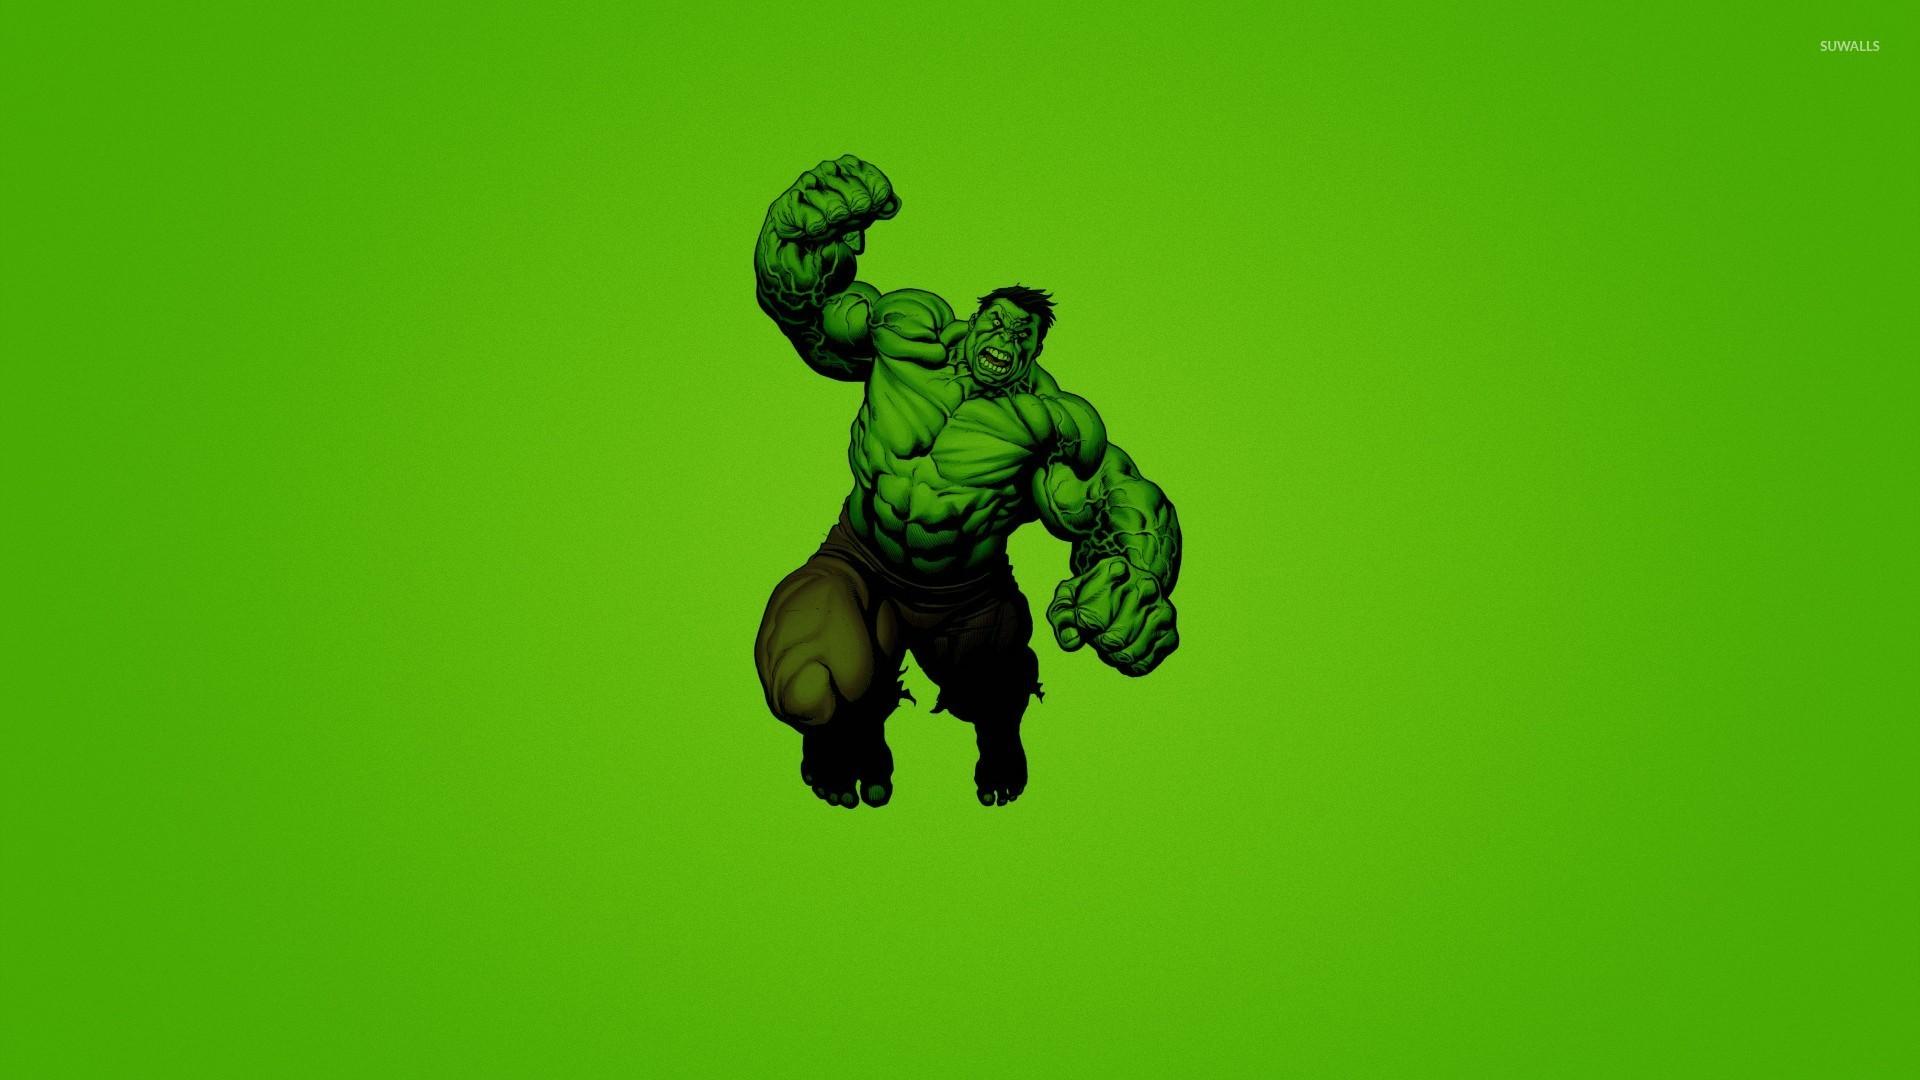 Hulk Wallpaper Desktop 4K FHDQ Images LLGL Wallpapers 1920x1080